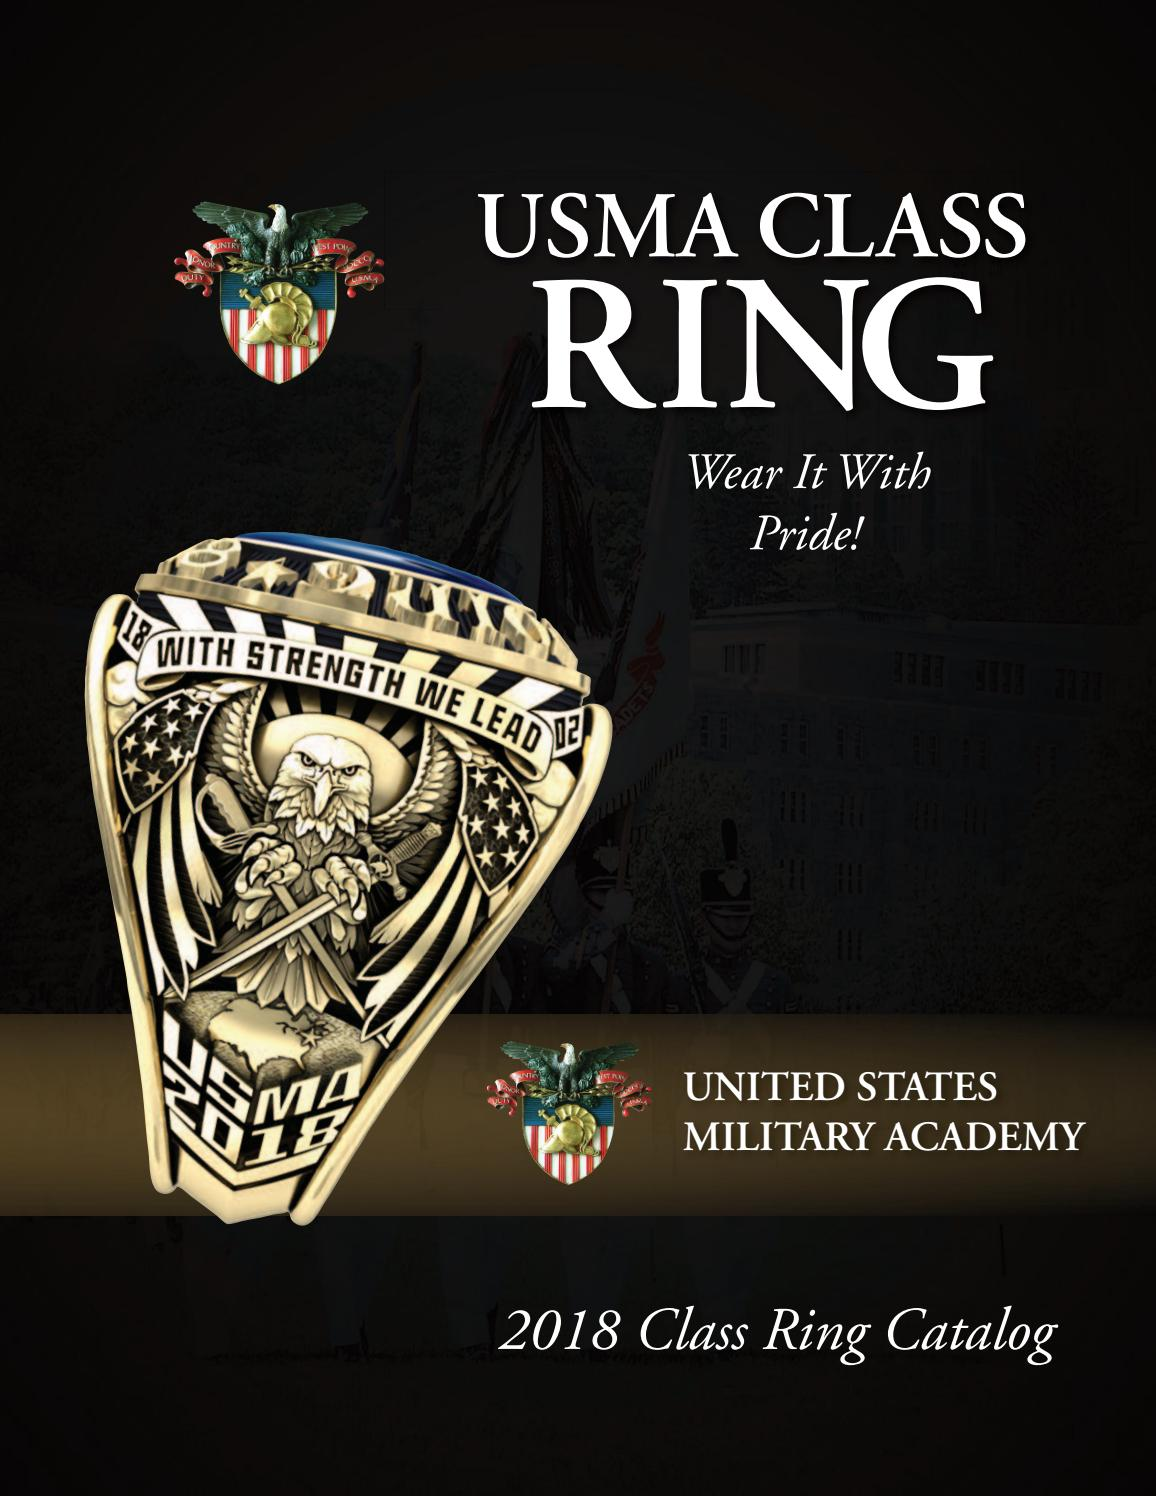 West Point 2018 Catalog by Jostens - Issuu